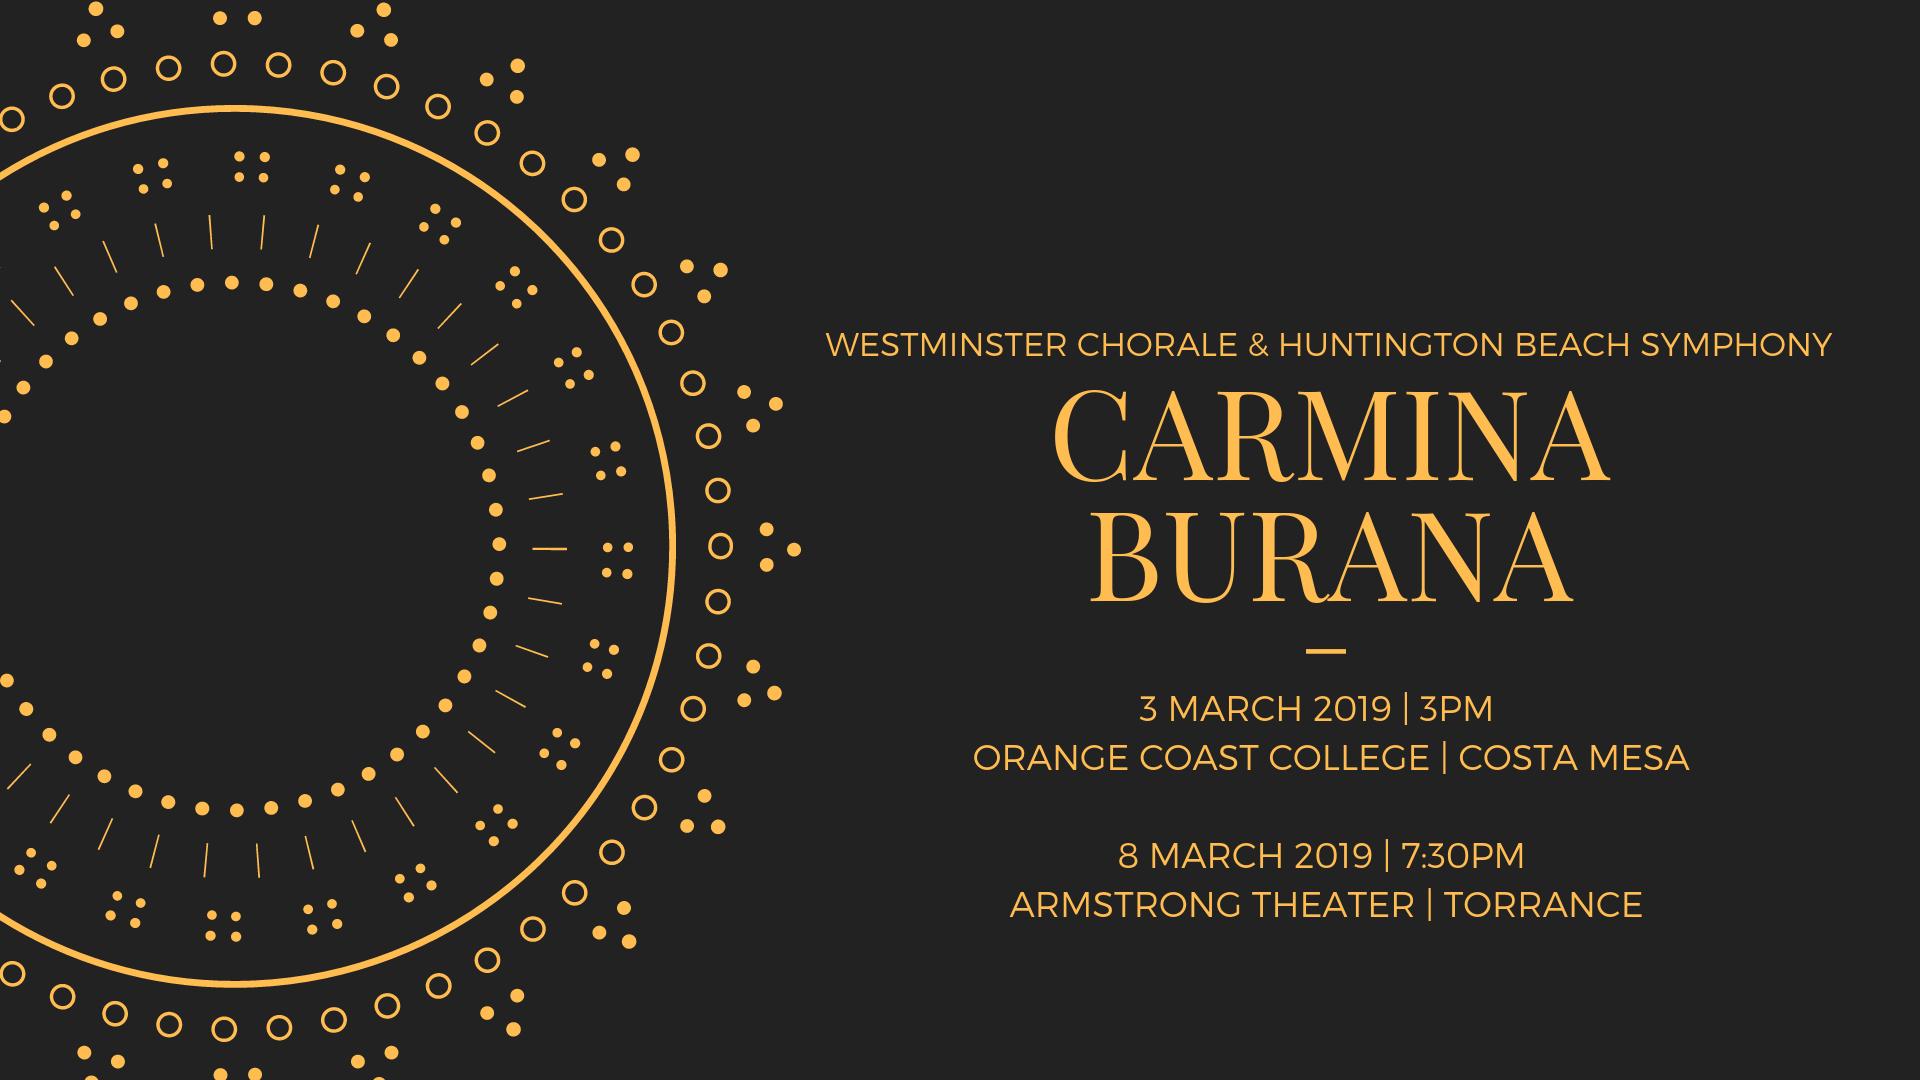 Singers - Carmina Burana - Westminster Chorale